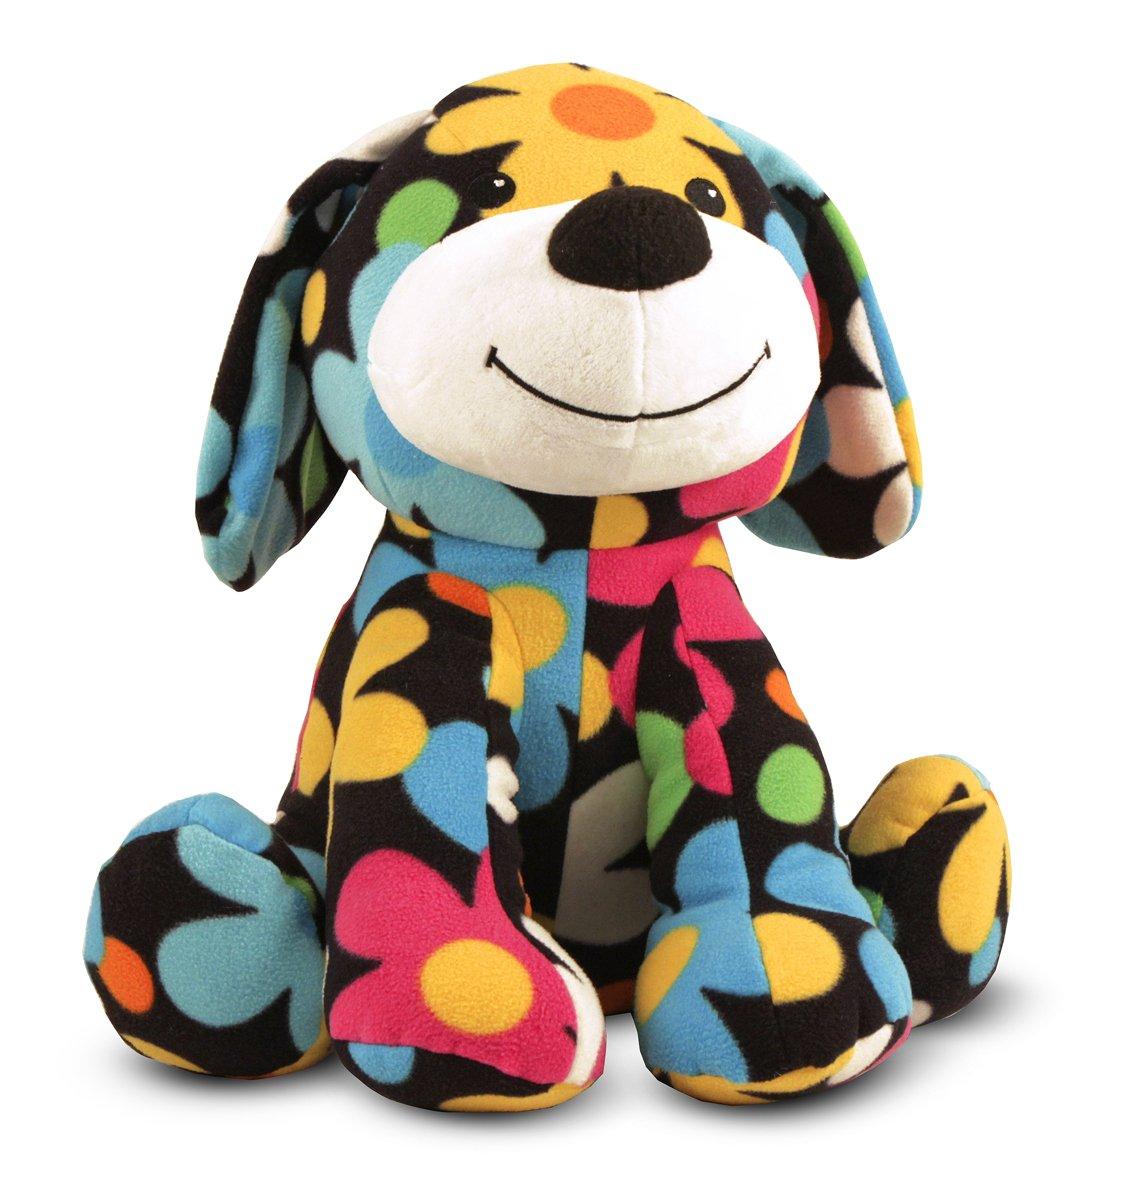 Melissa & Doug Bloomer Dog - Patterned Pal Stuffed Animal